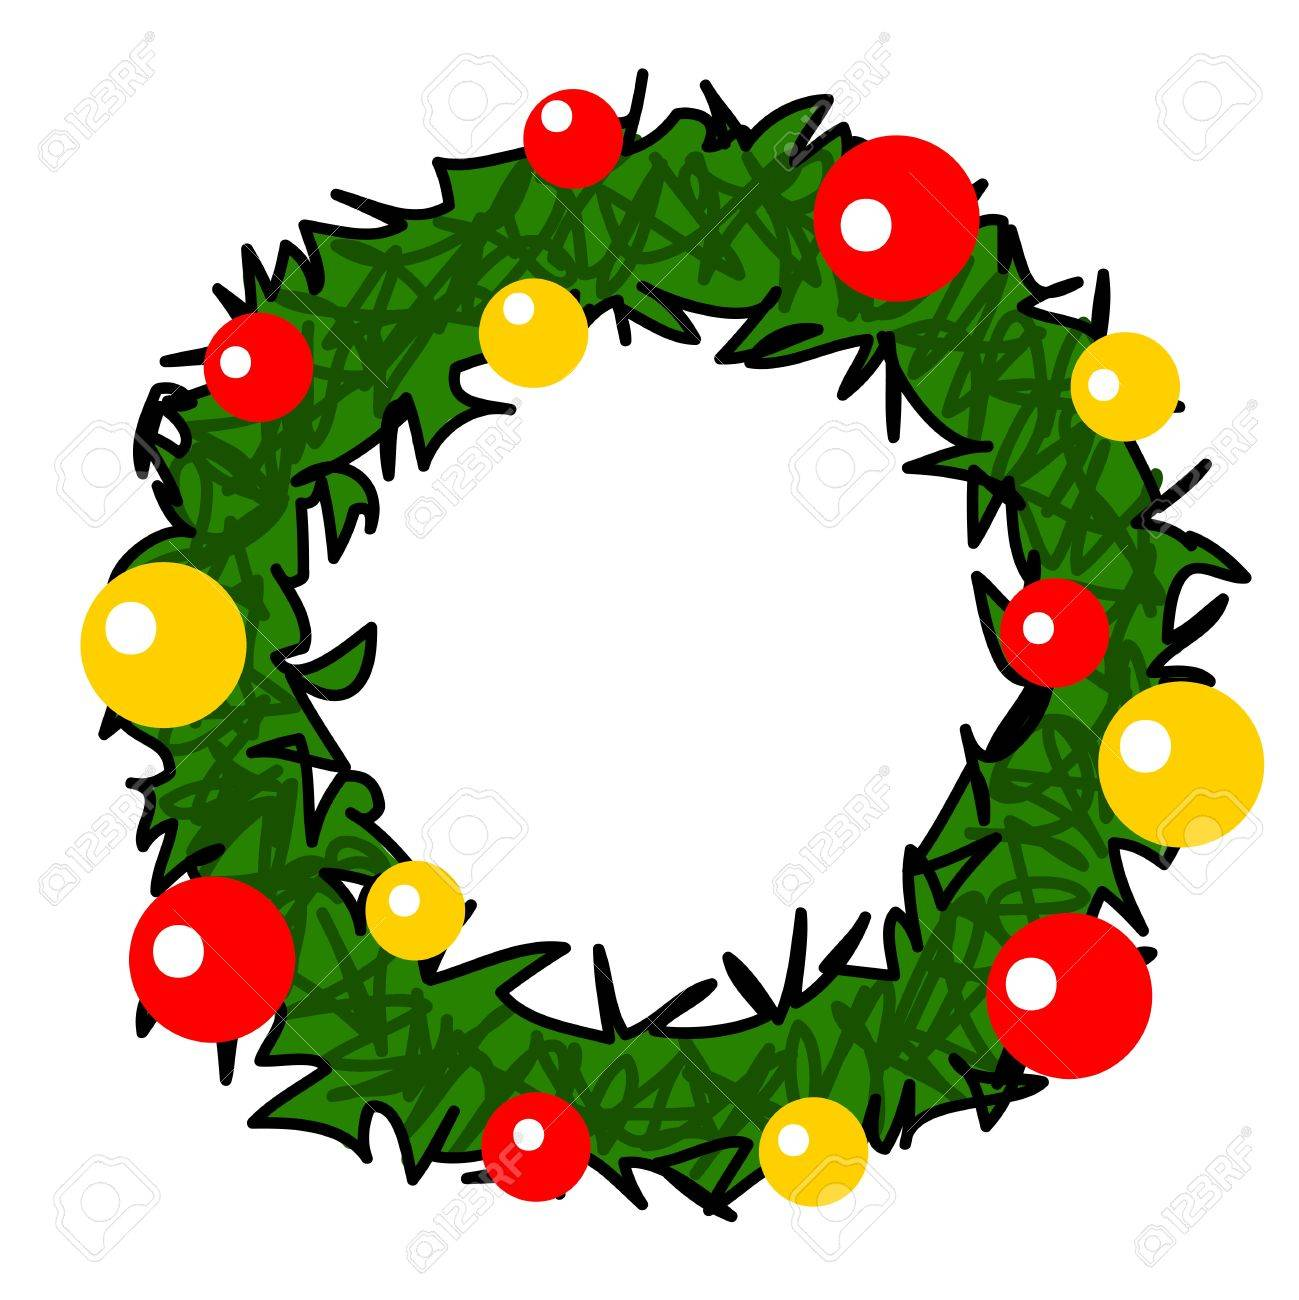 Christmas Wreath Cartoon Royalty Free Cliparts Vectors And Stock